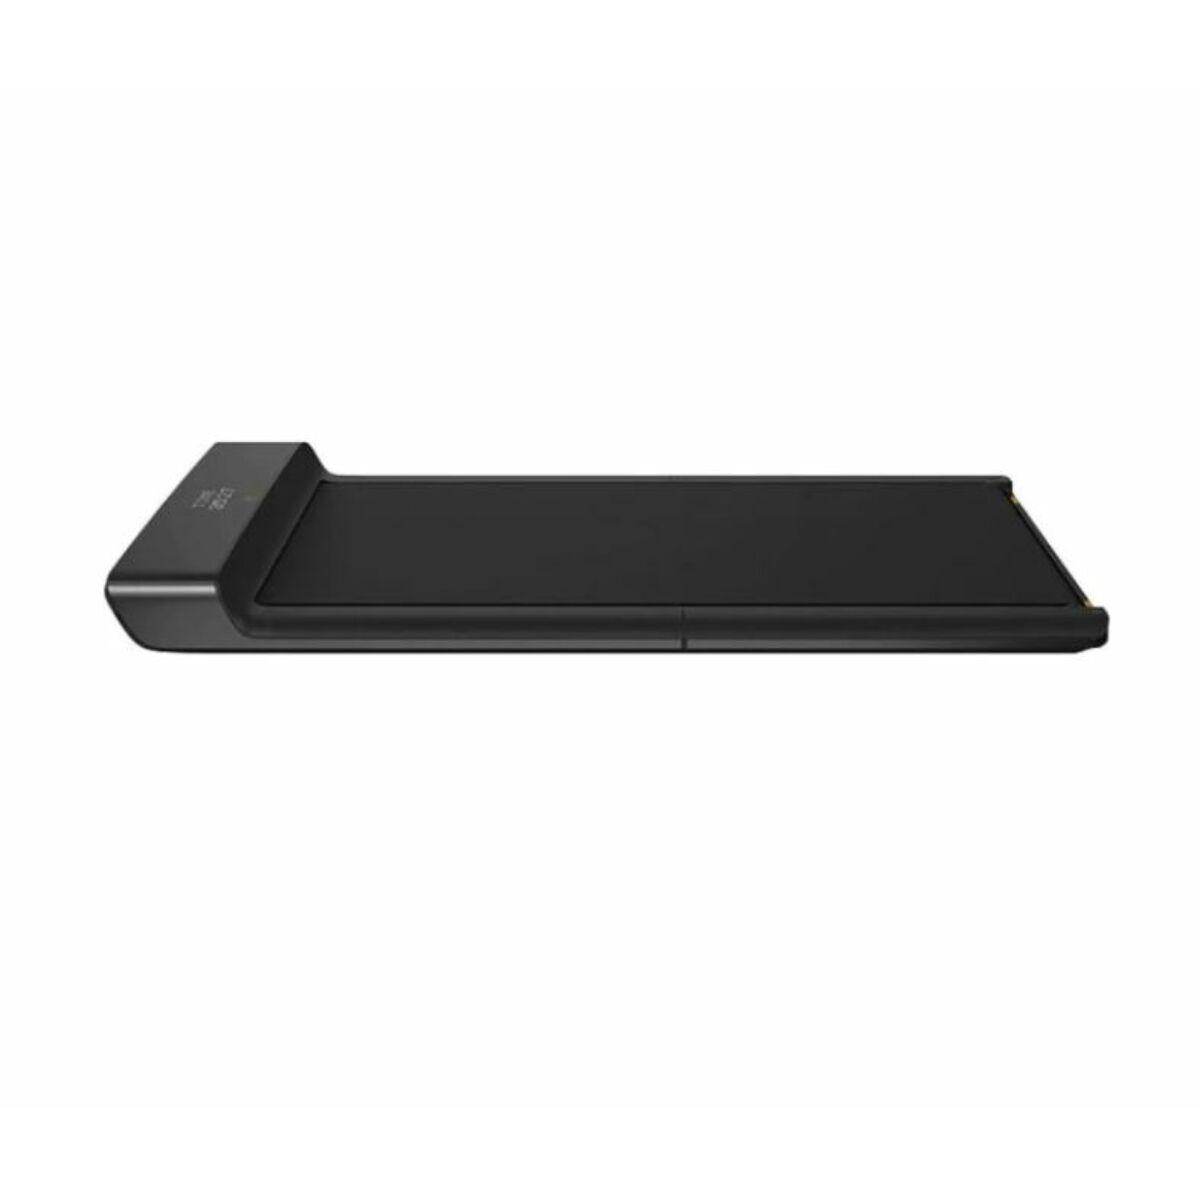 Xiaomi Kingsmith Walking Pad A1 Pro WPA1F okos futópad fekete EU